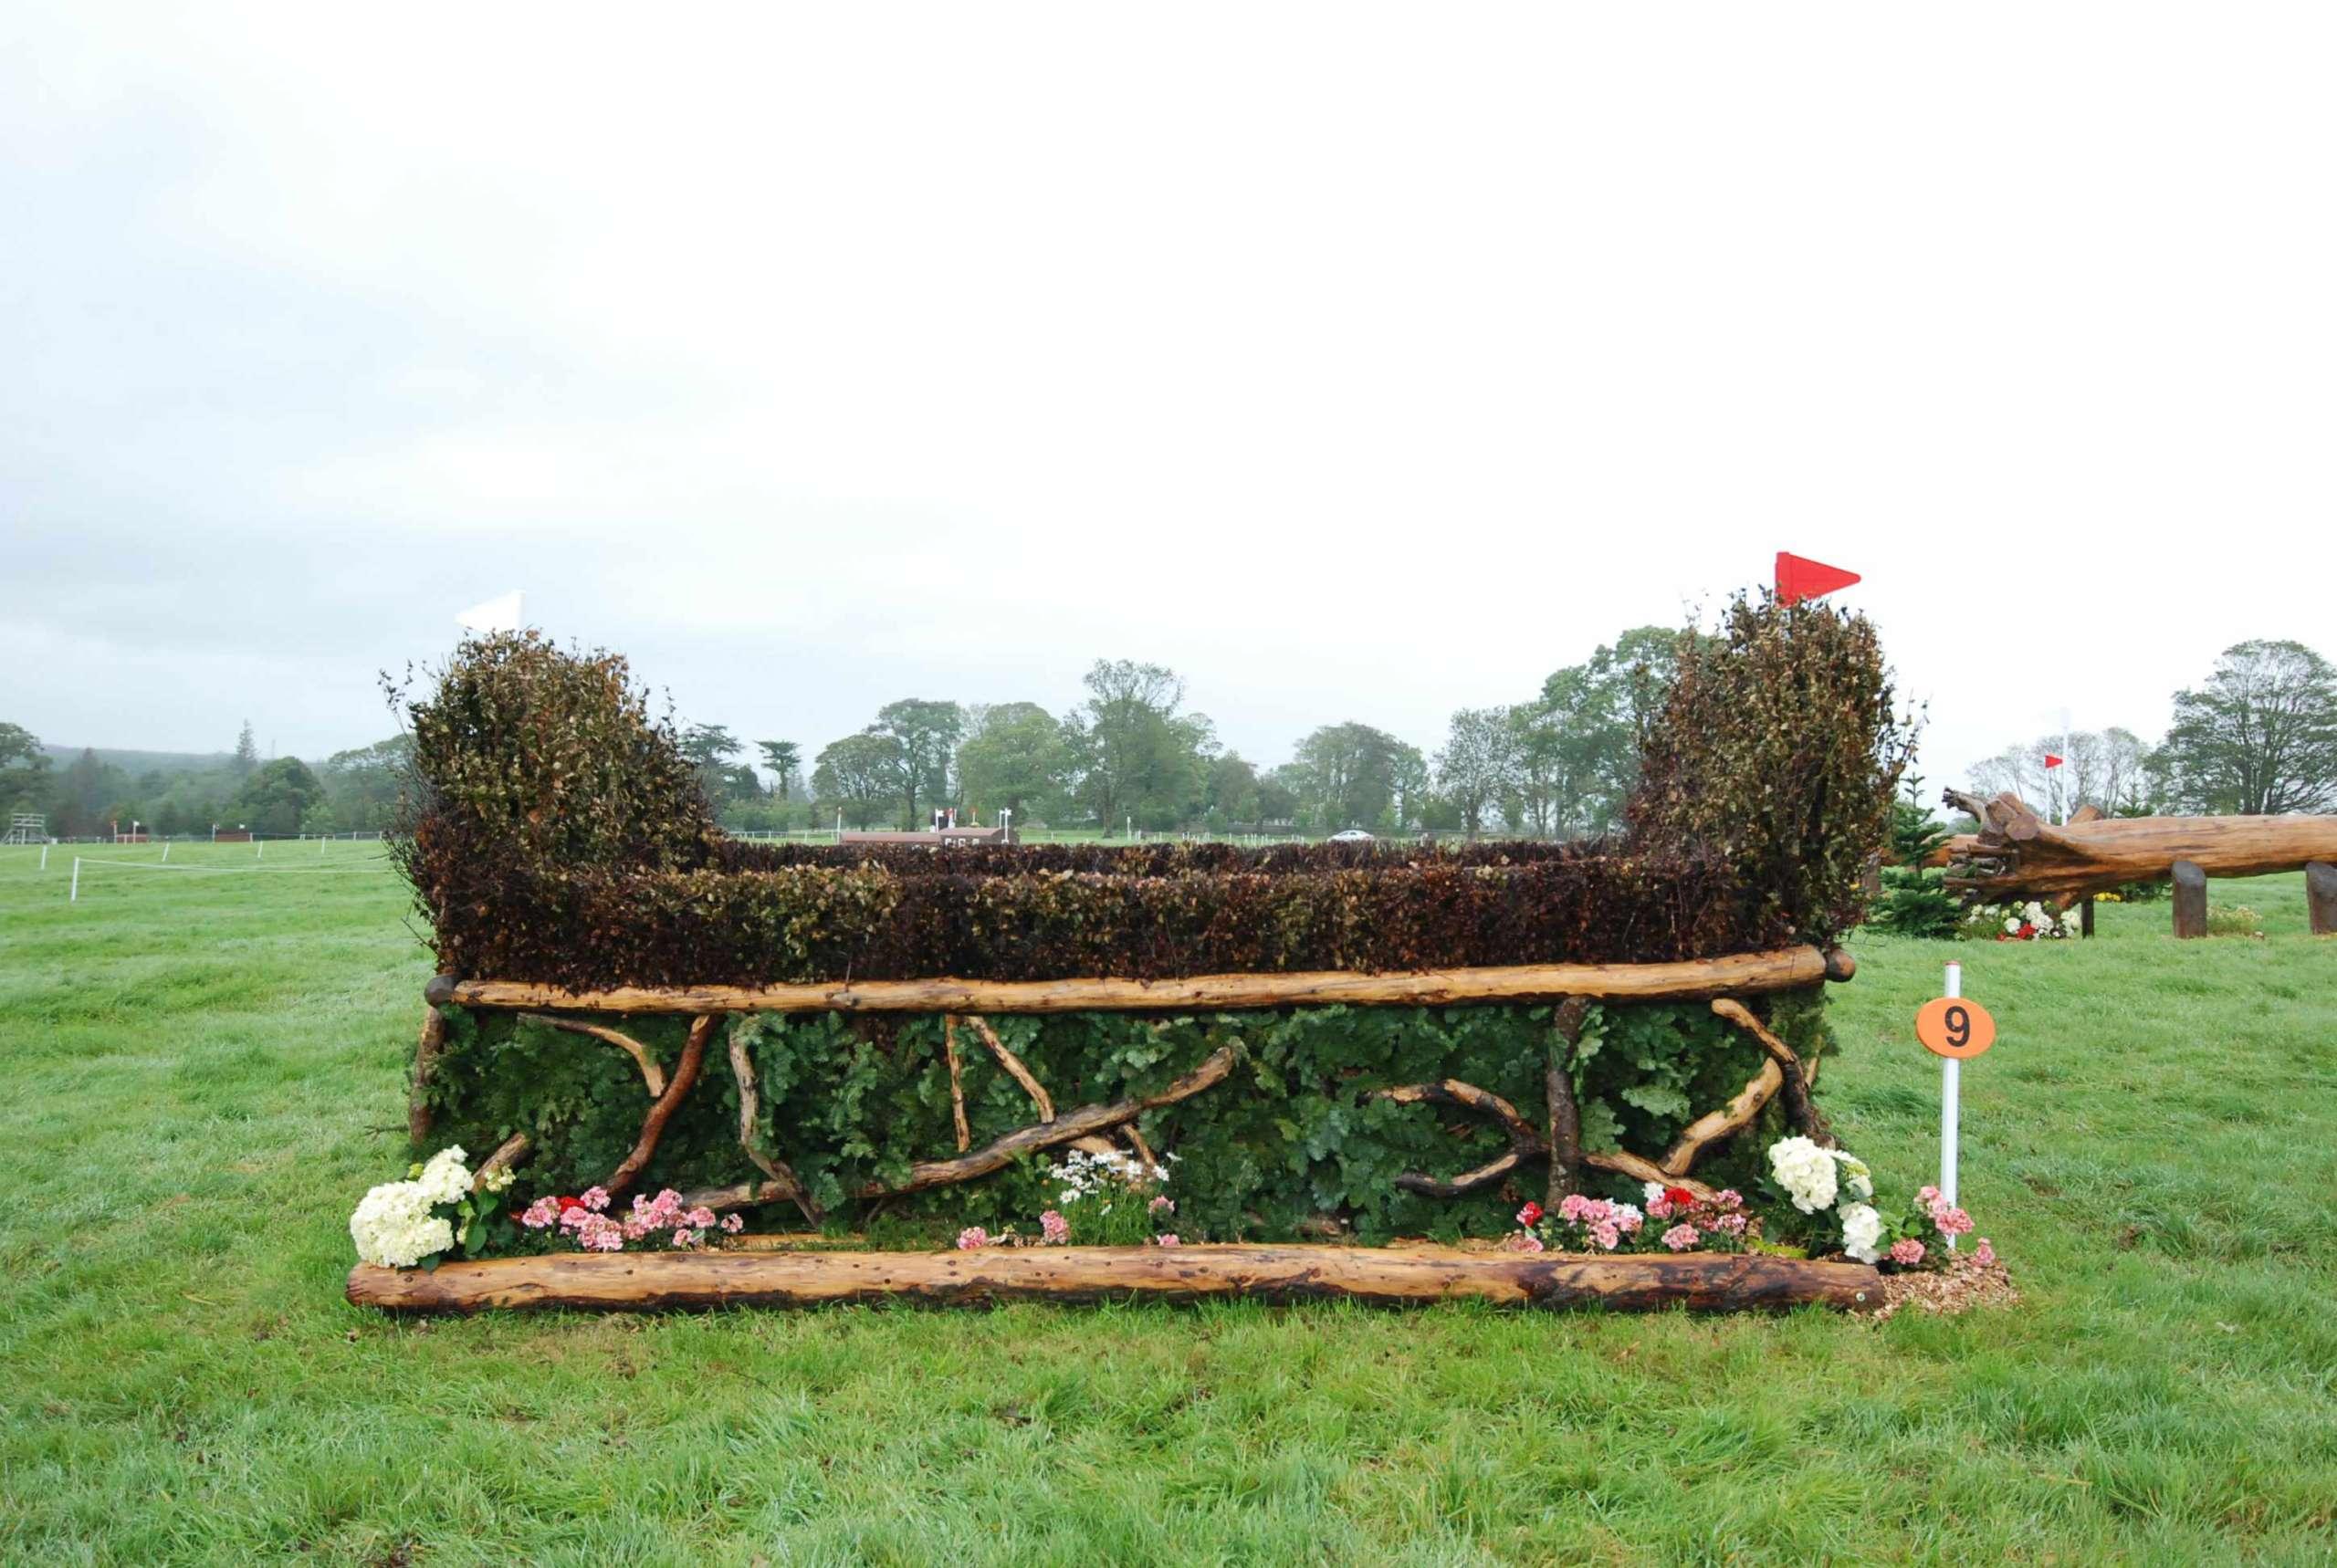 Millstreet International Horse Trials 2019 – Wednesday